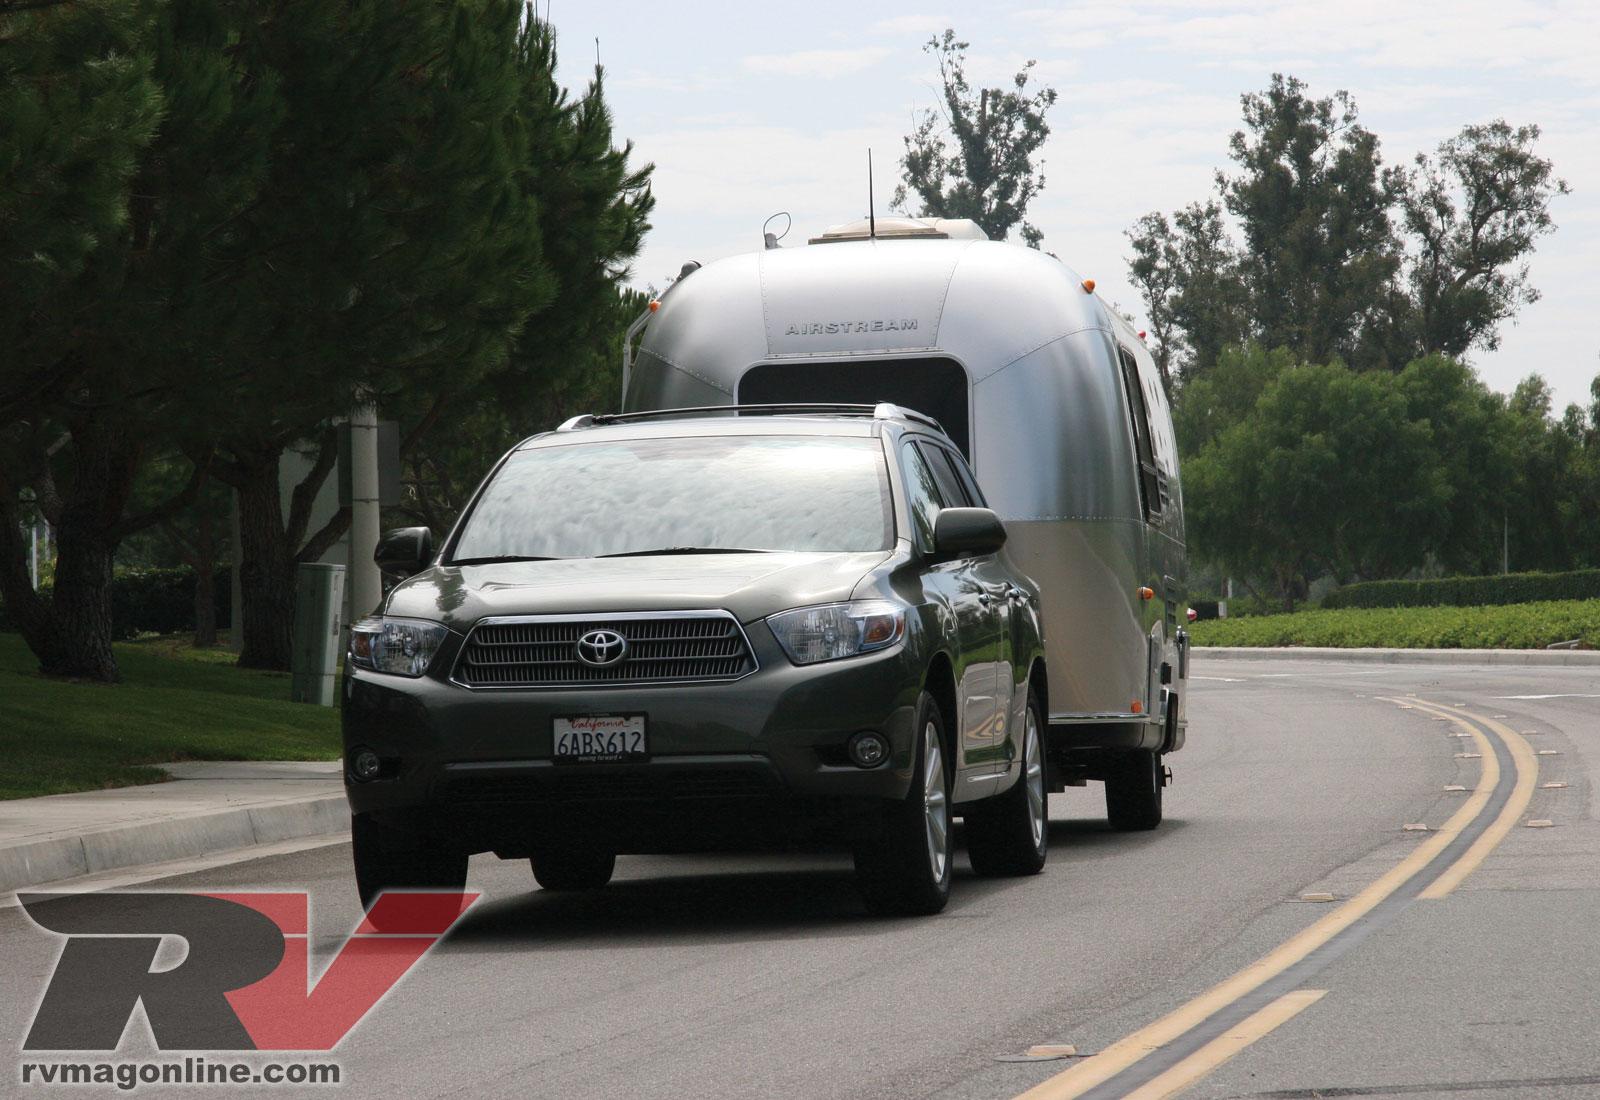 2008 Toyota Highlander Hybrid It S A